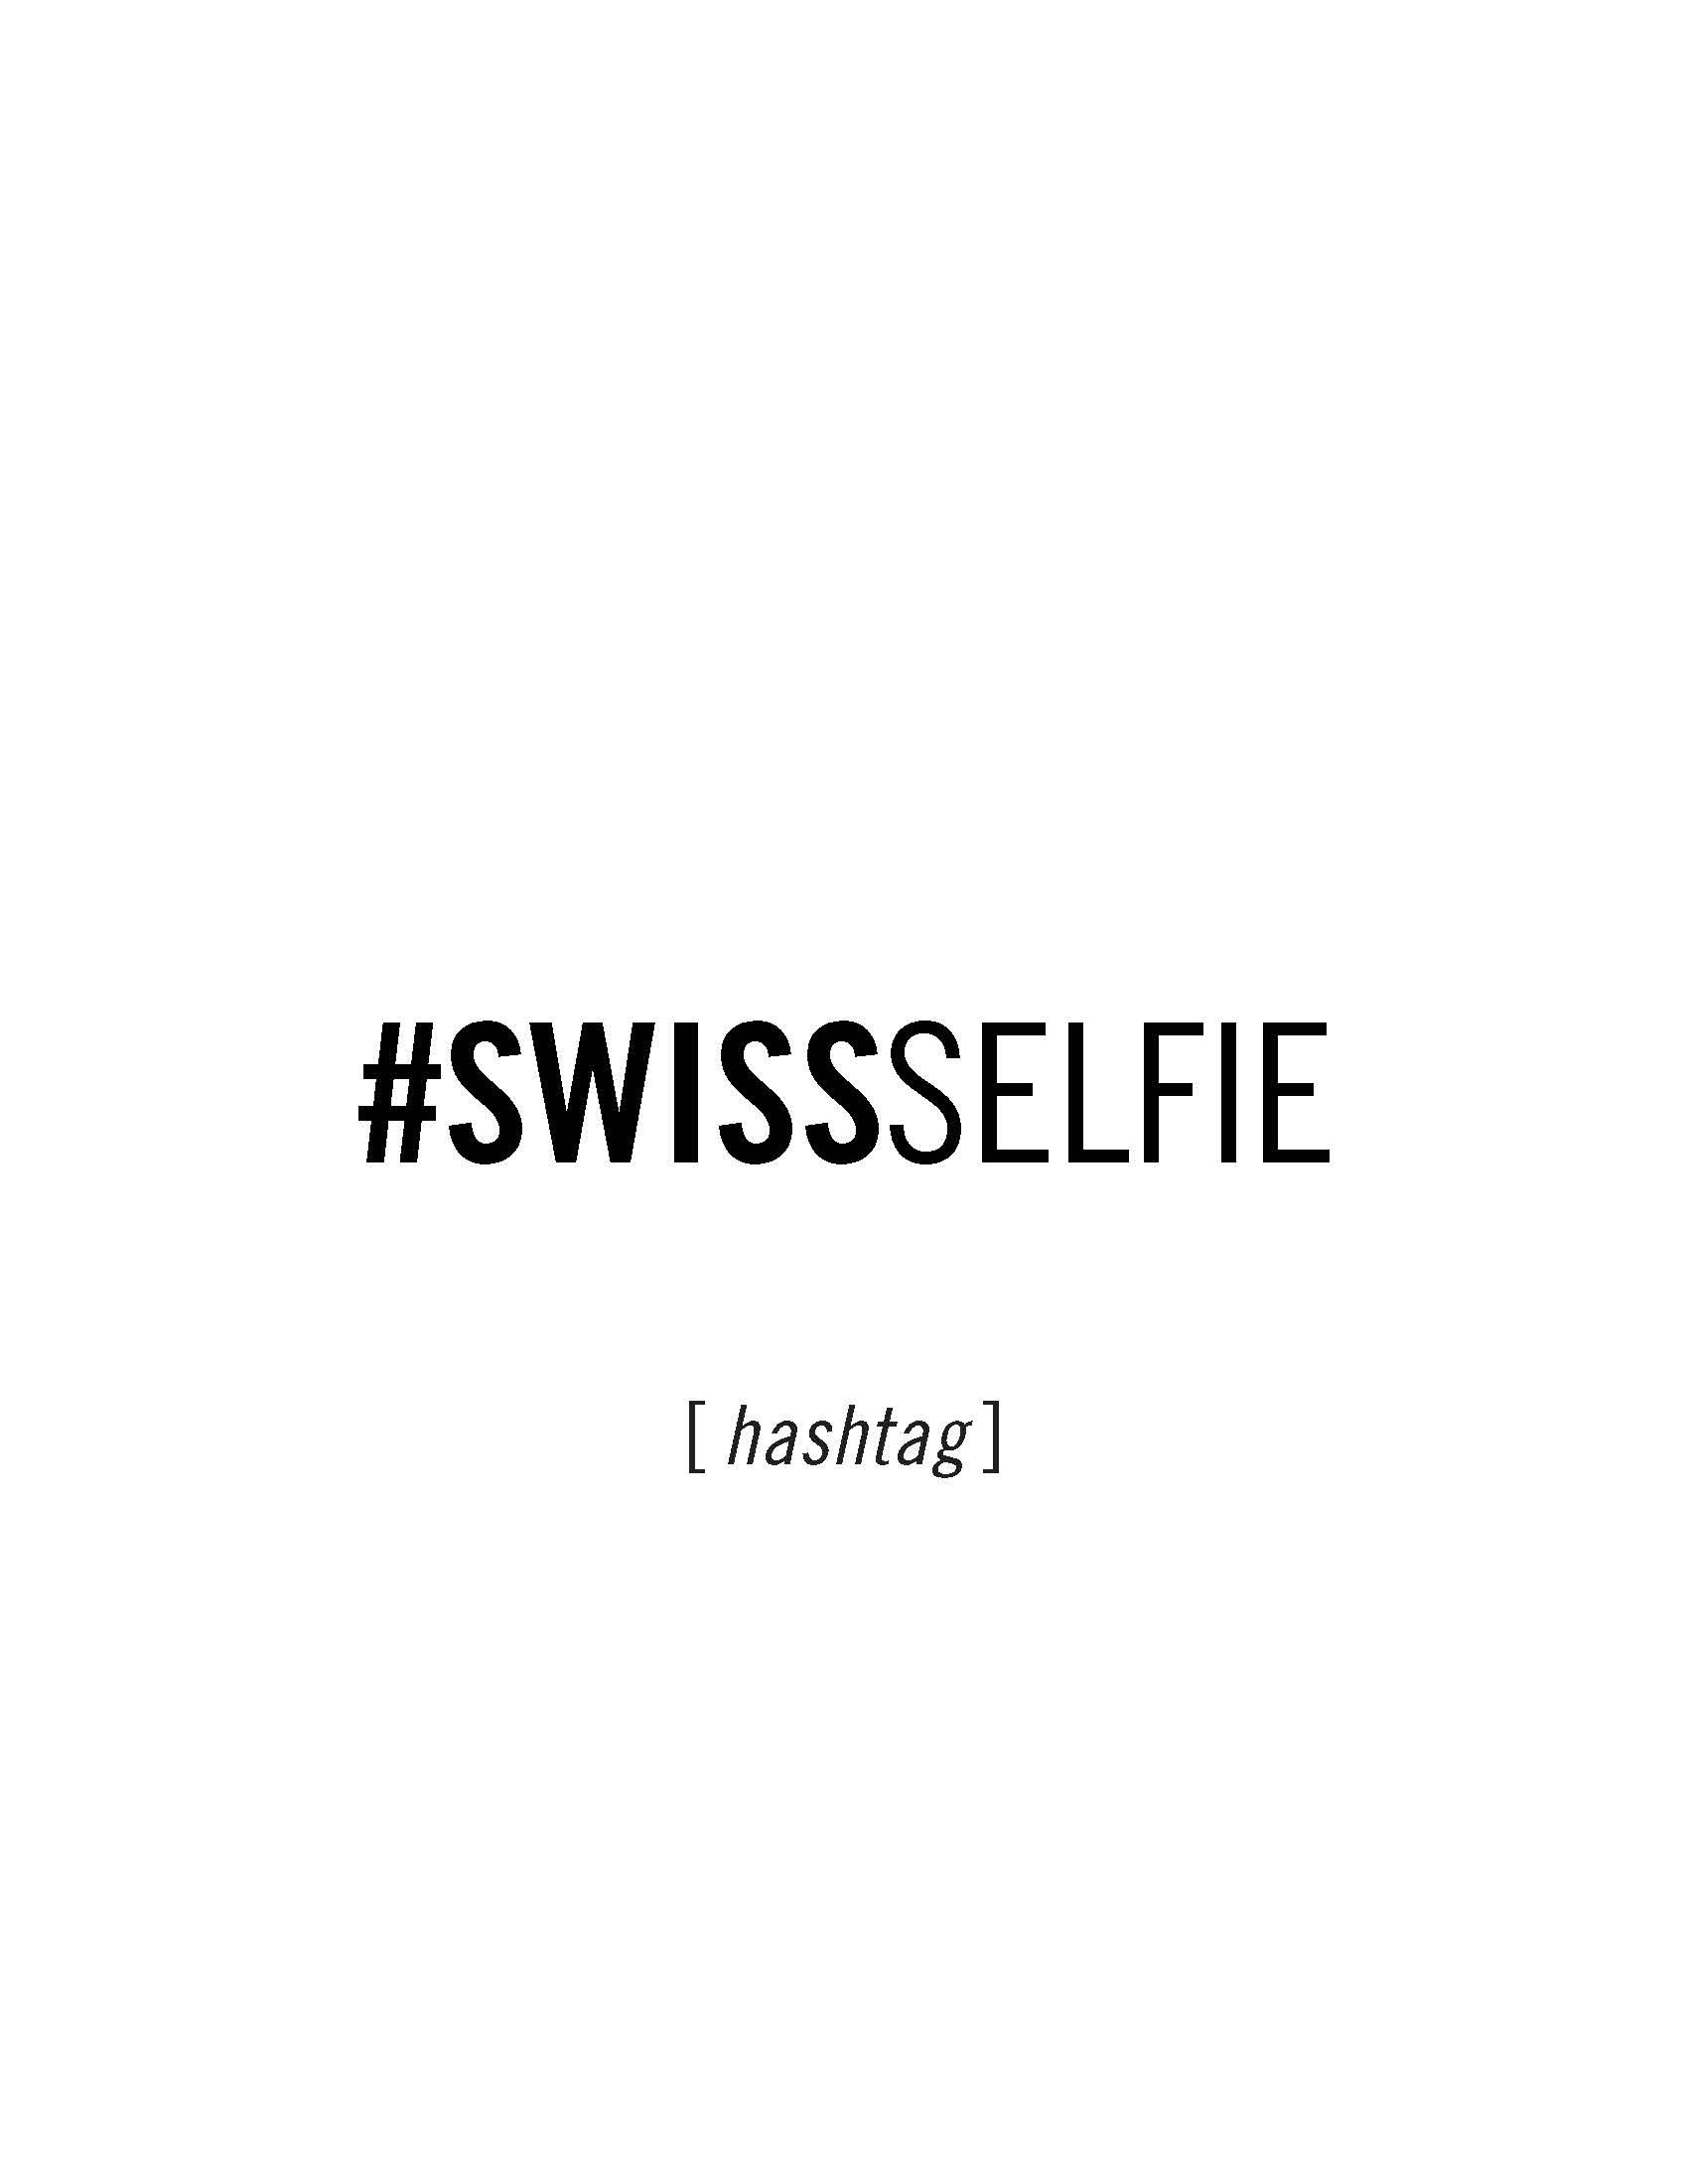 #SwissSelfie Campaign